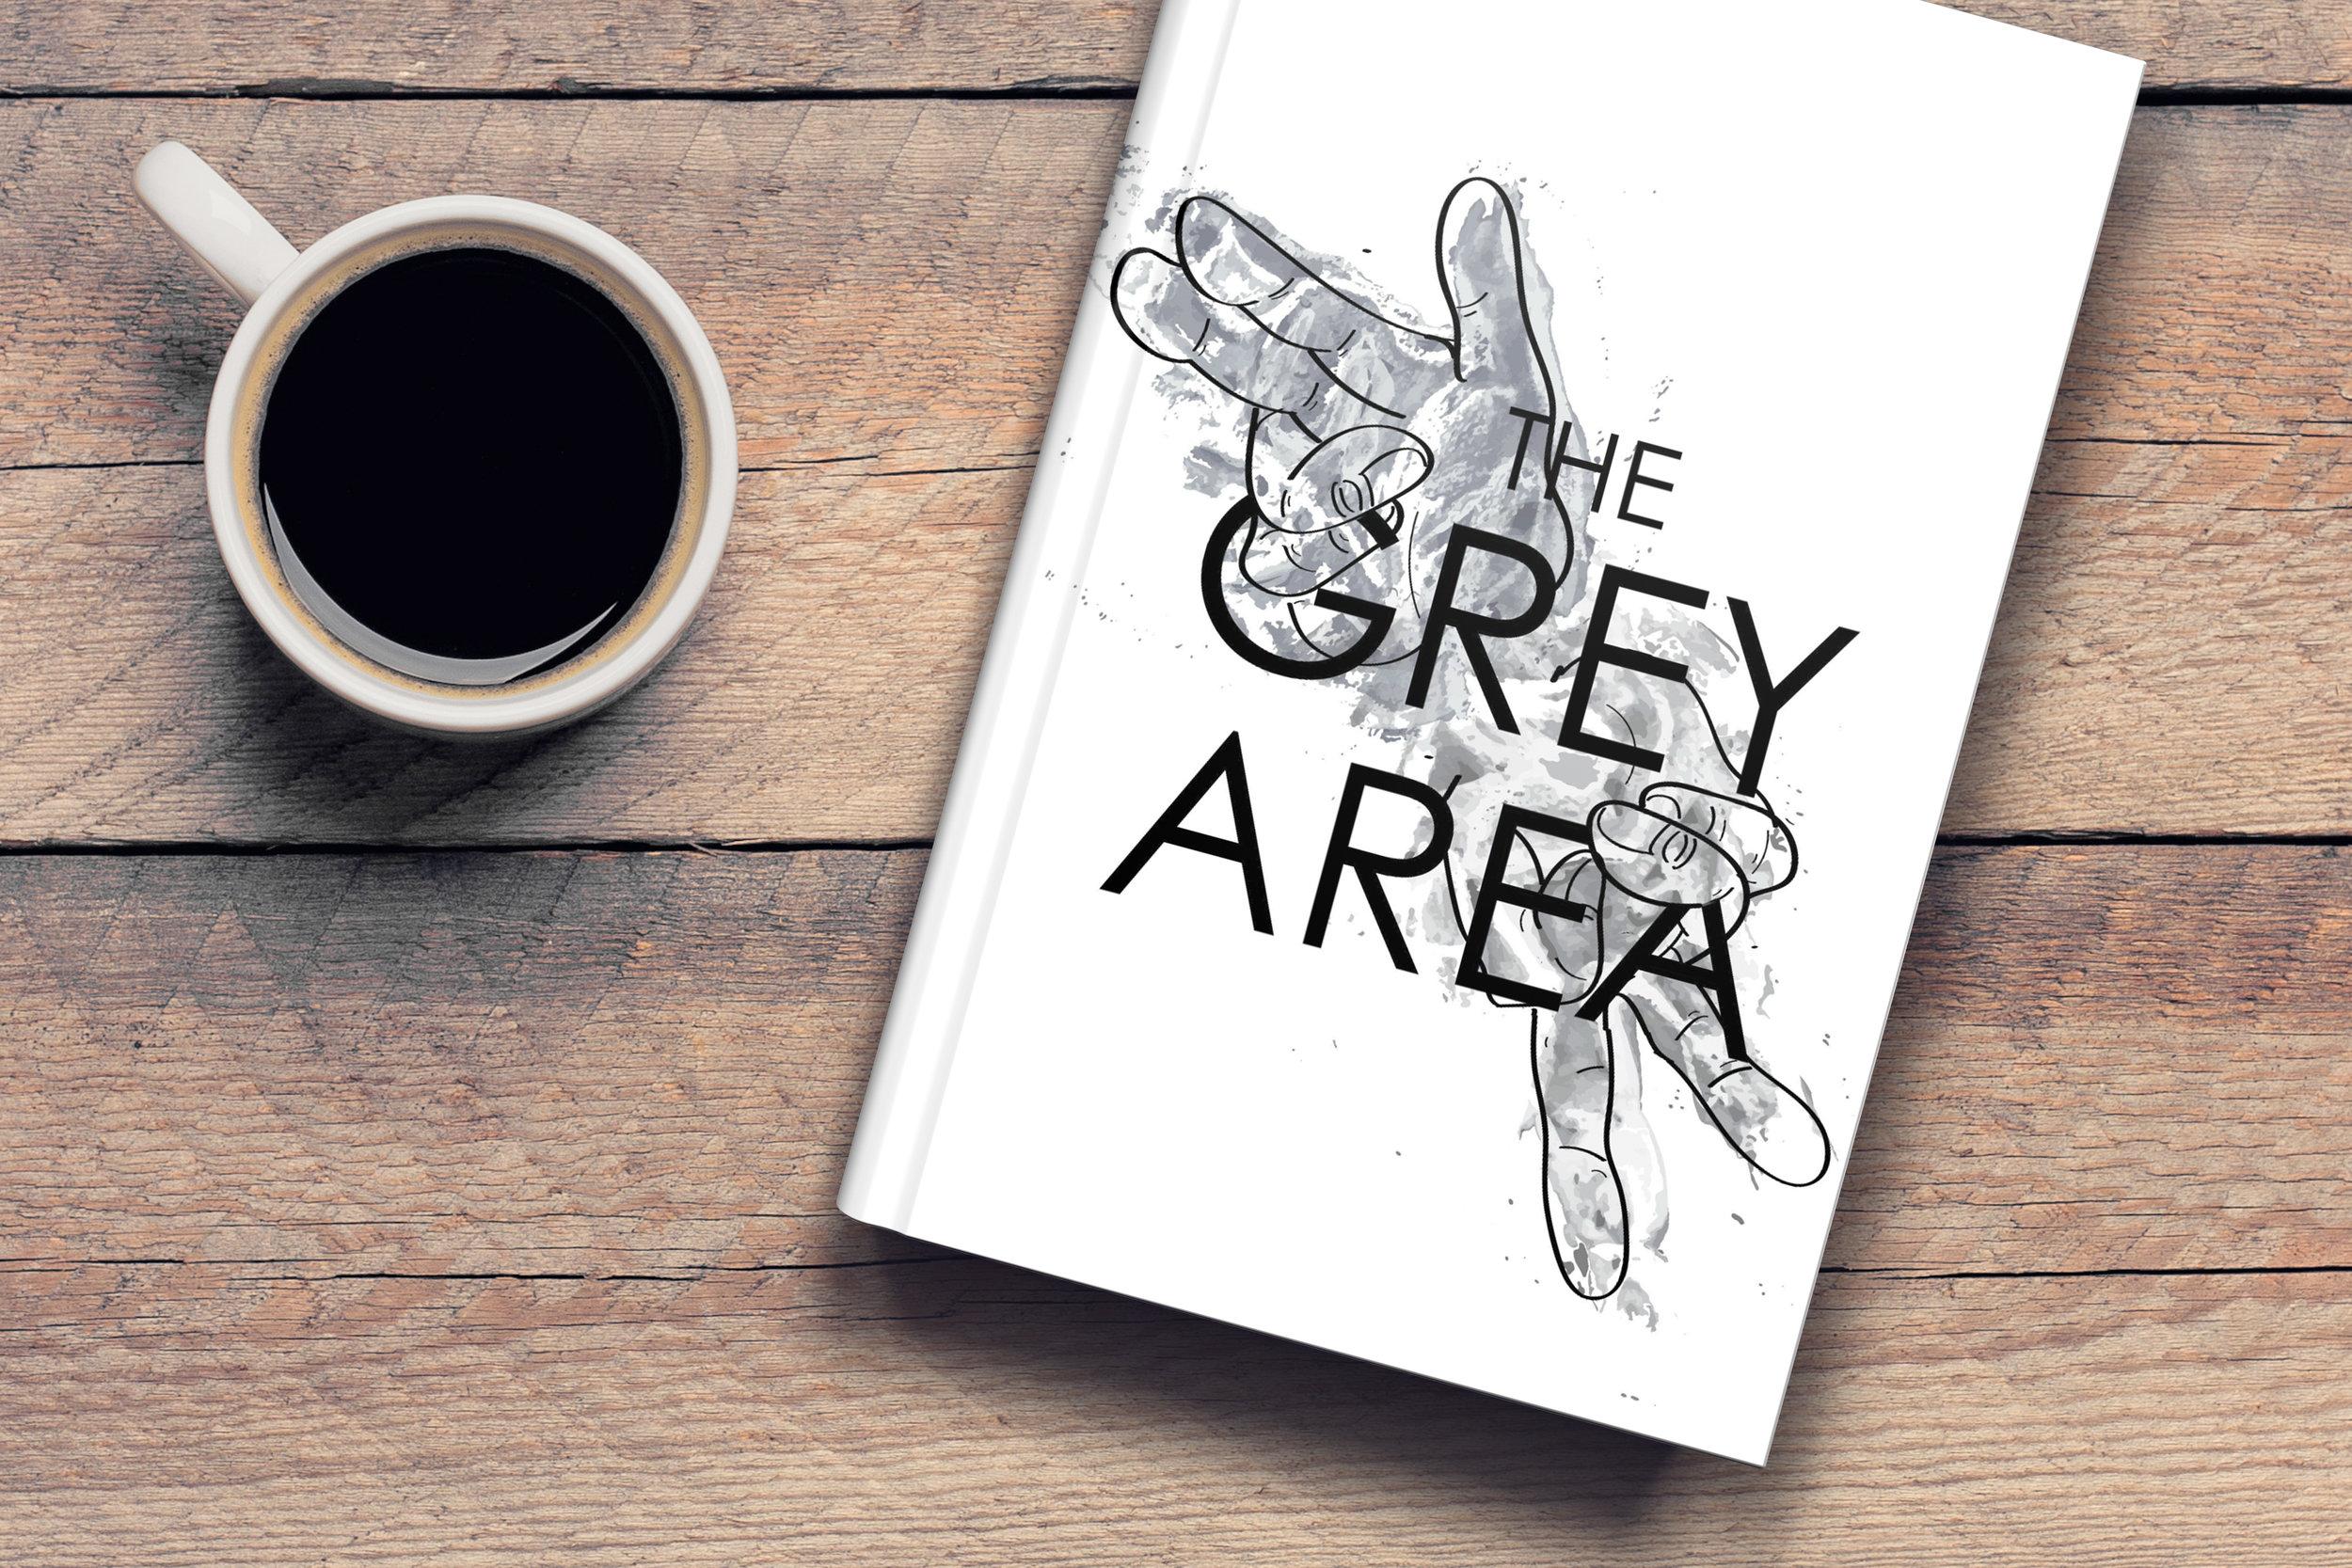 Grey area white.jpg